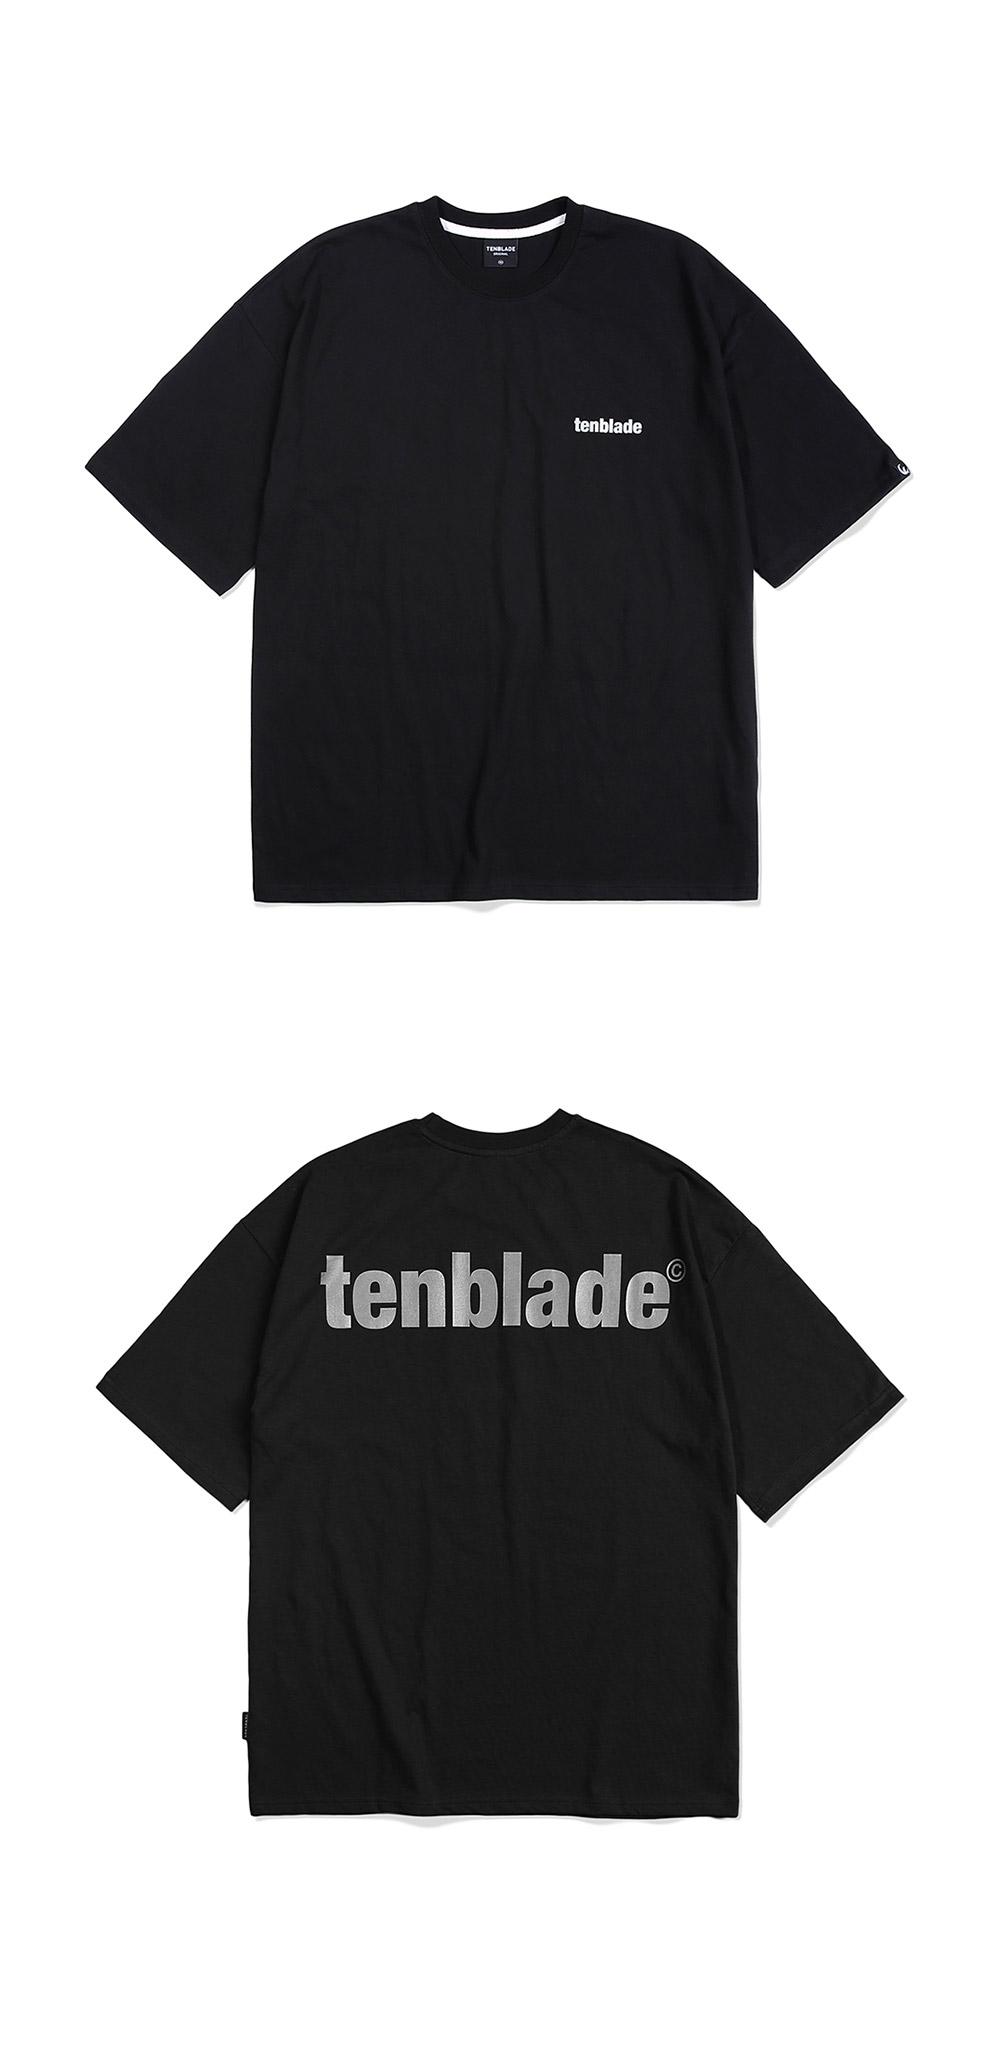 tbj101ss-black-06.jpg